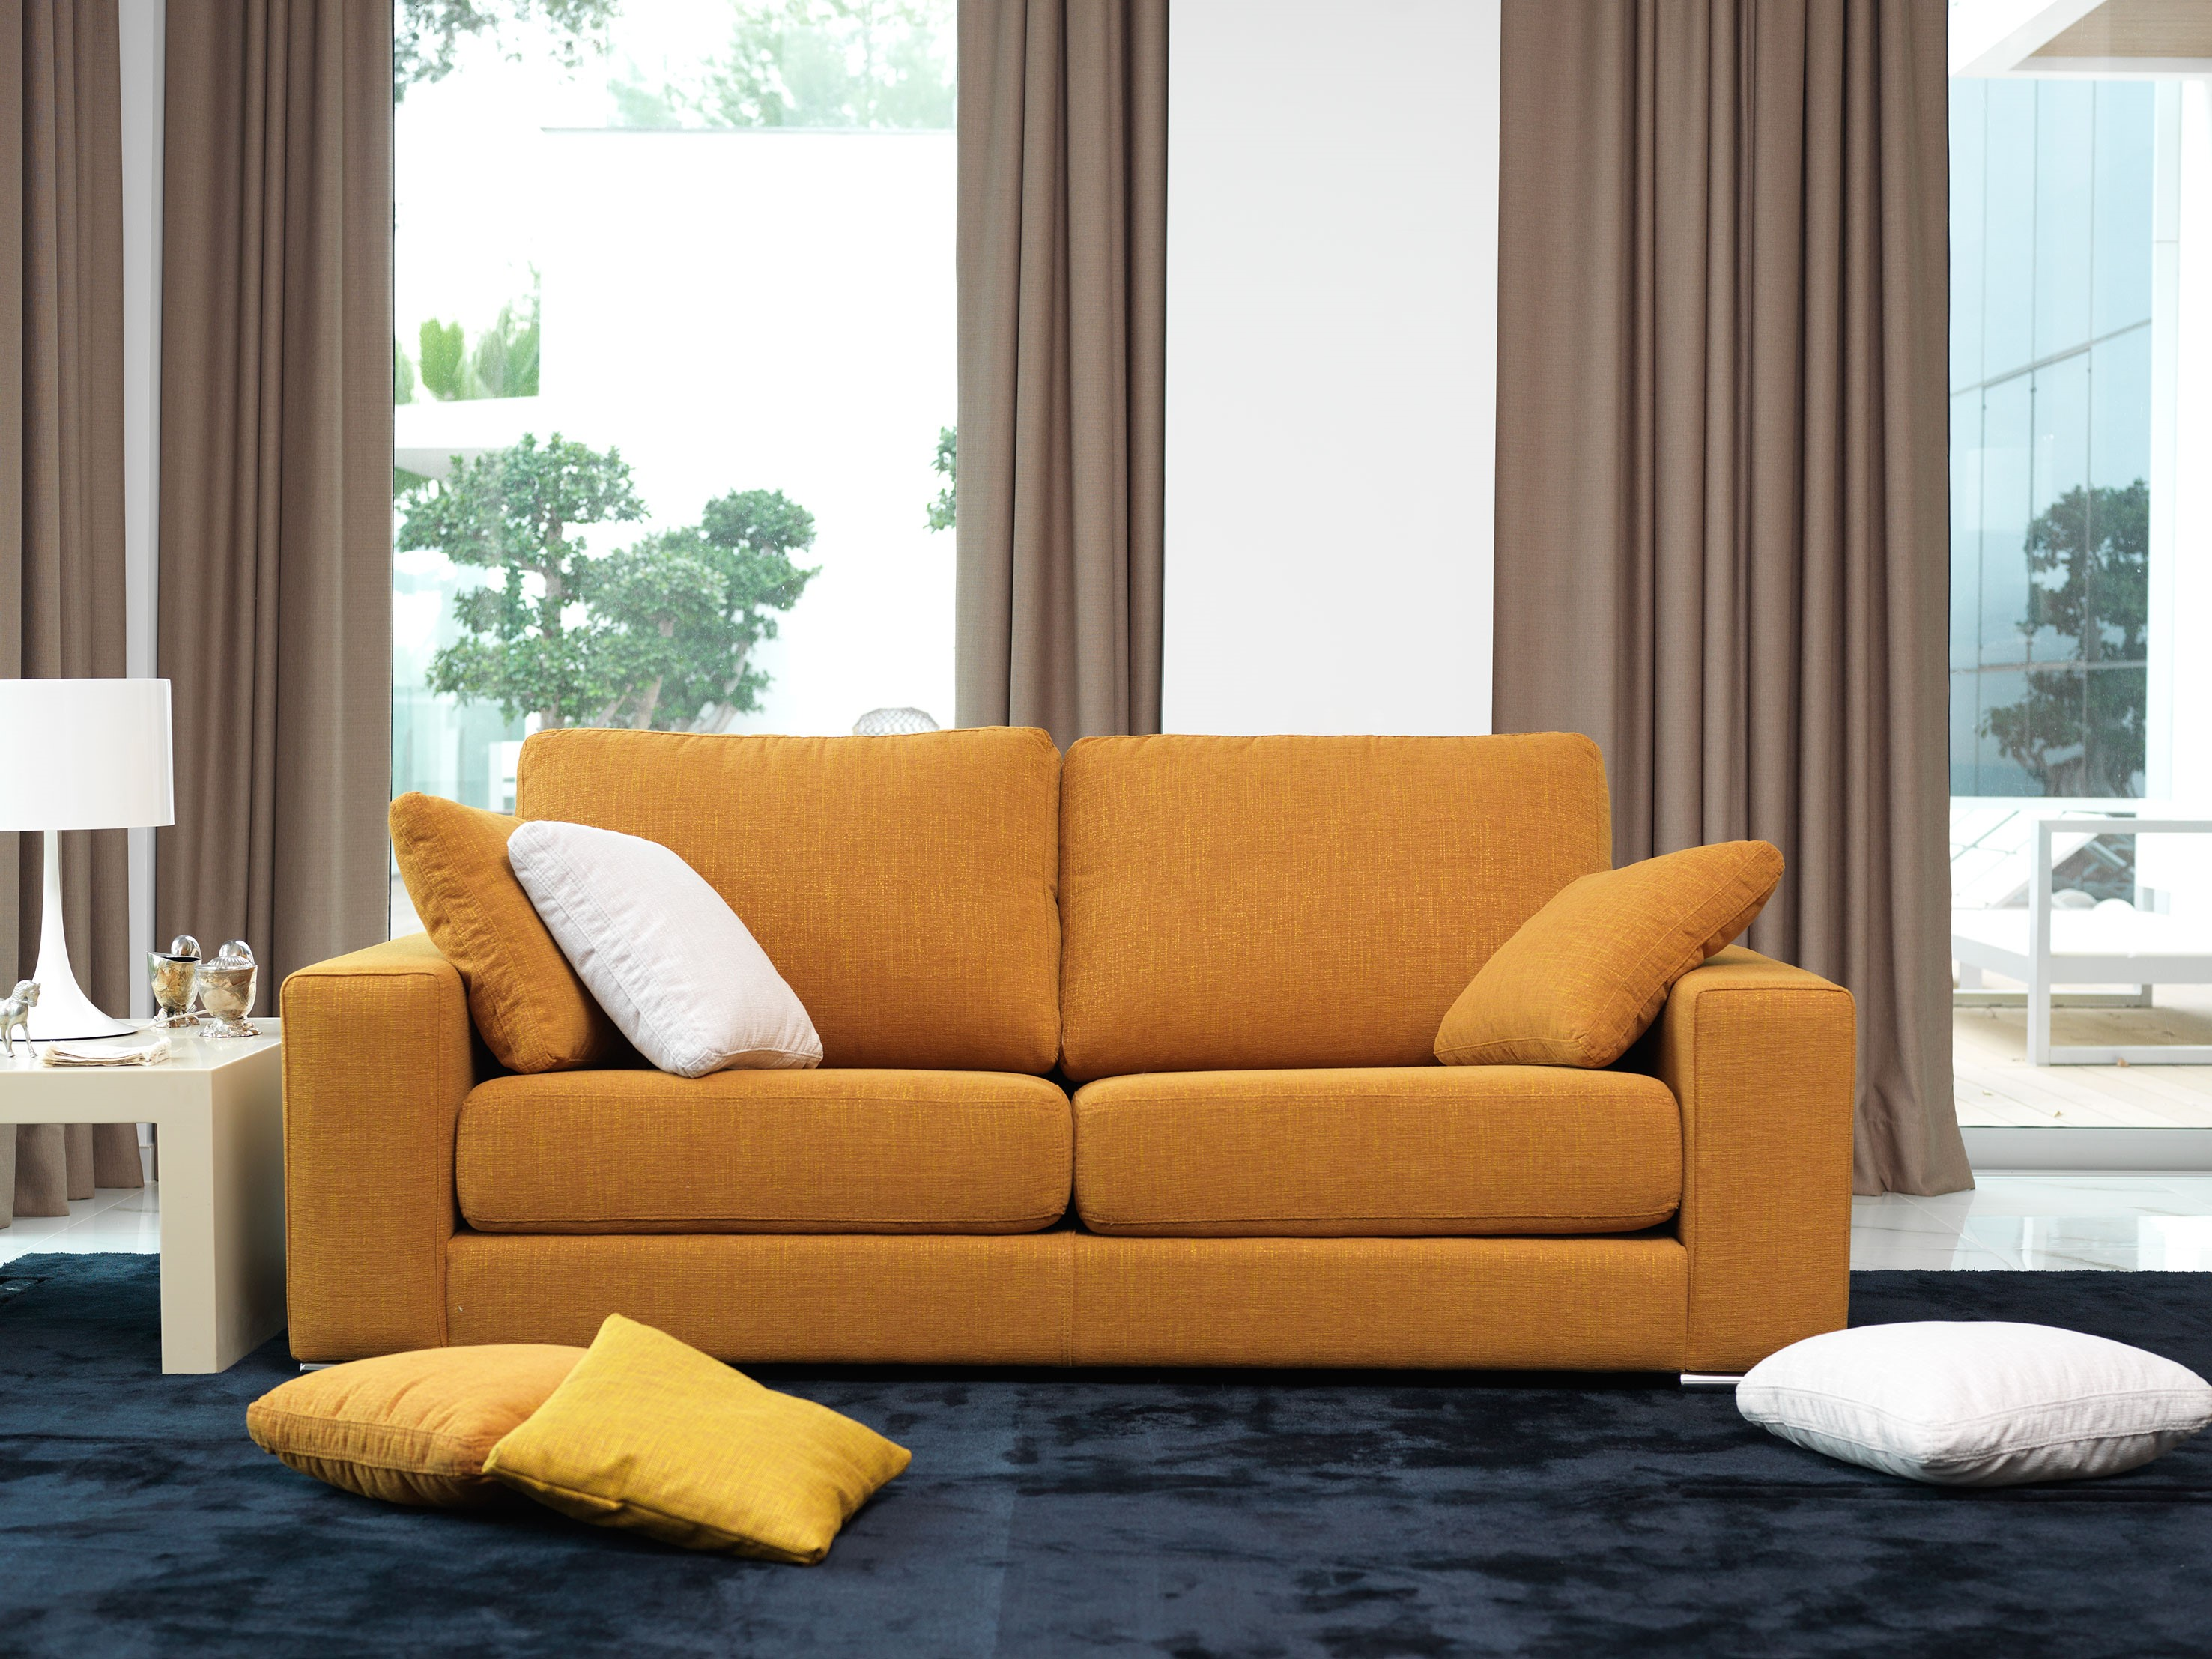 C mo elegir telas para decorar mejor tu casa for Tapices para sillas modernas